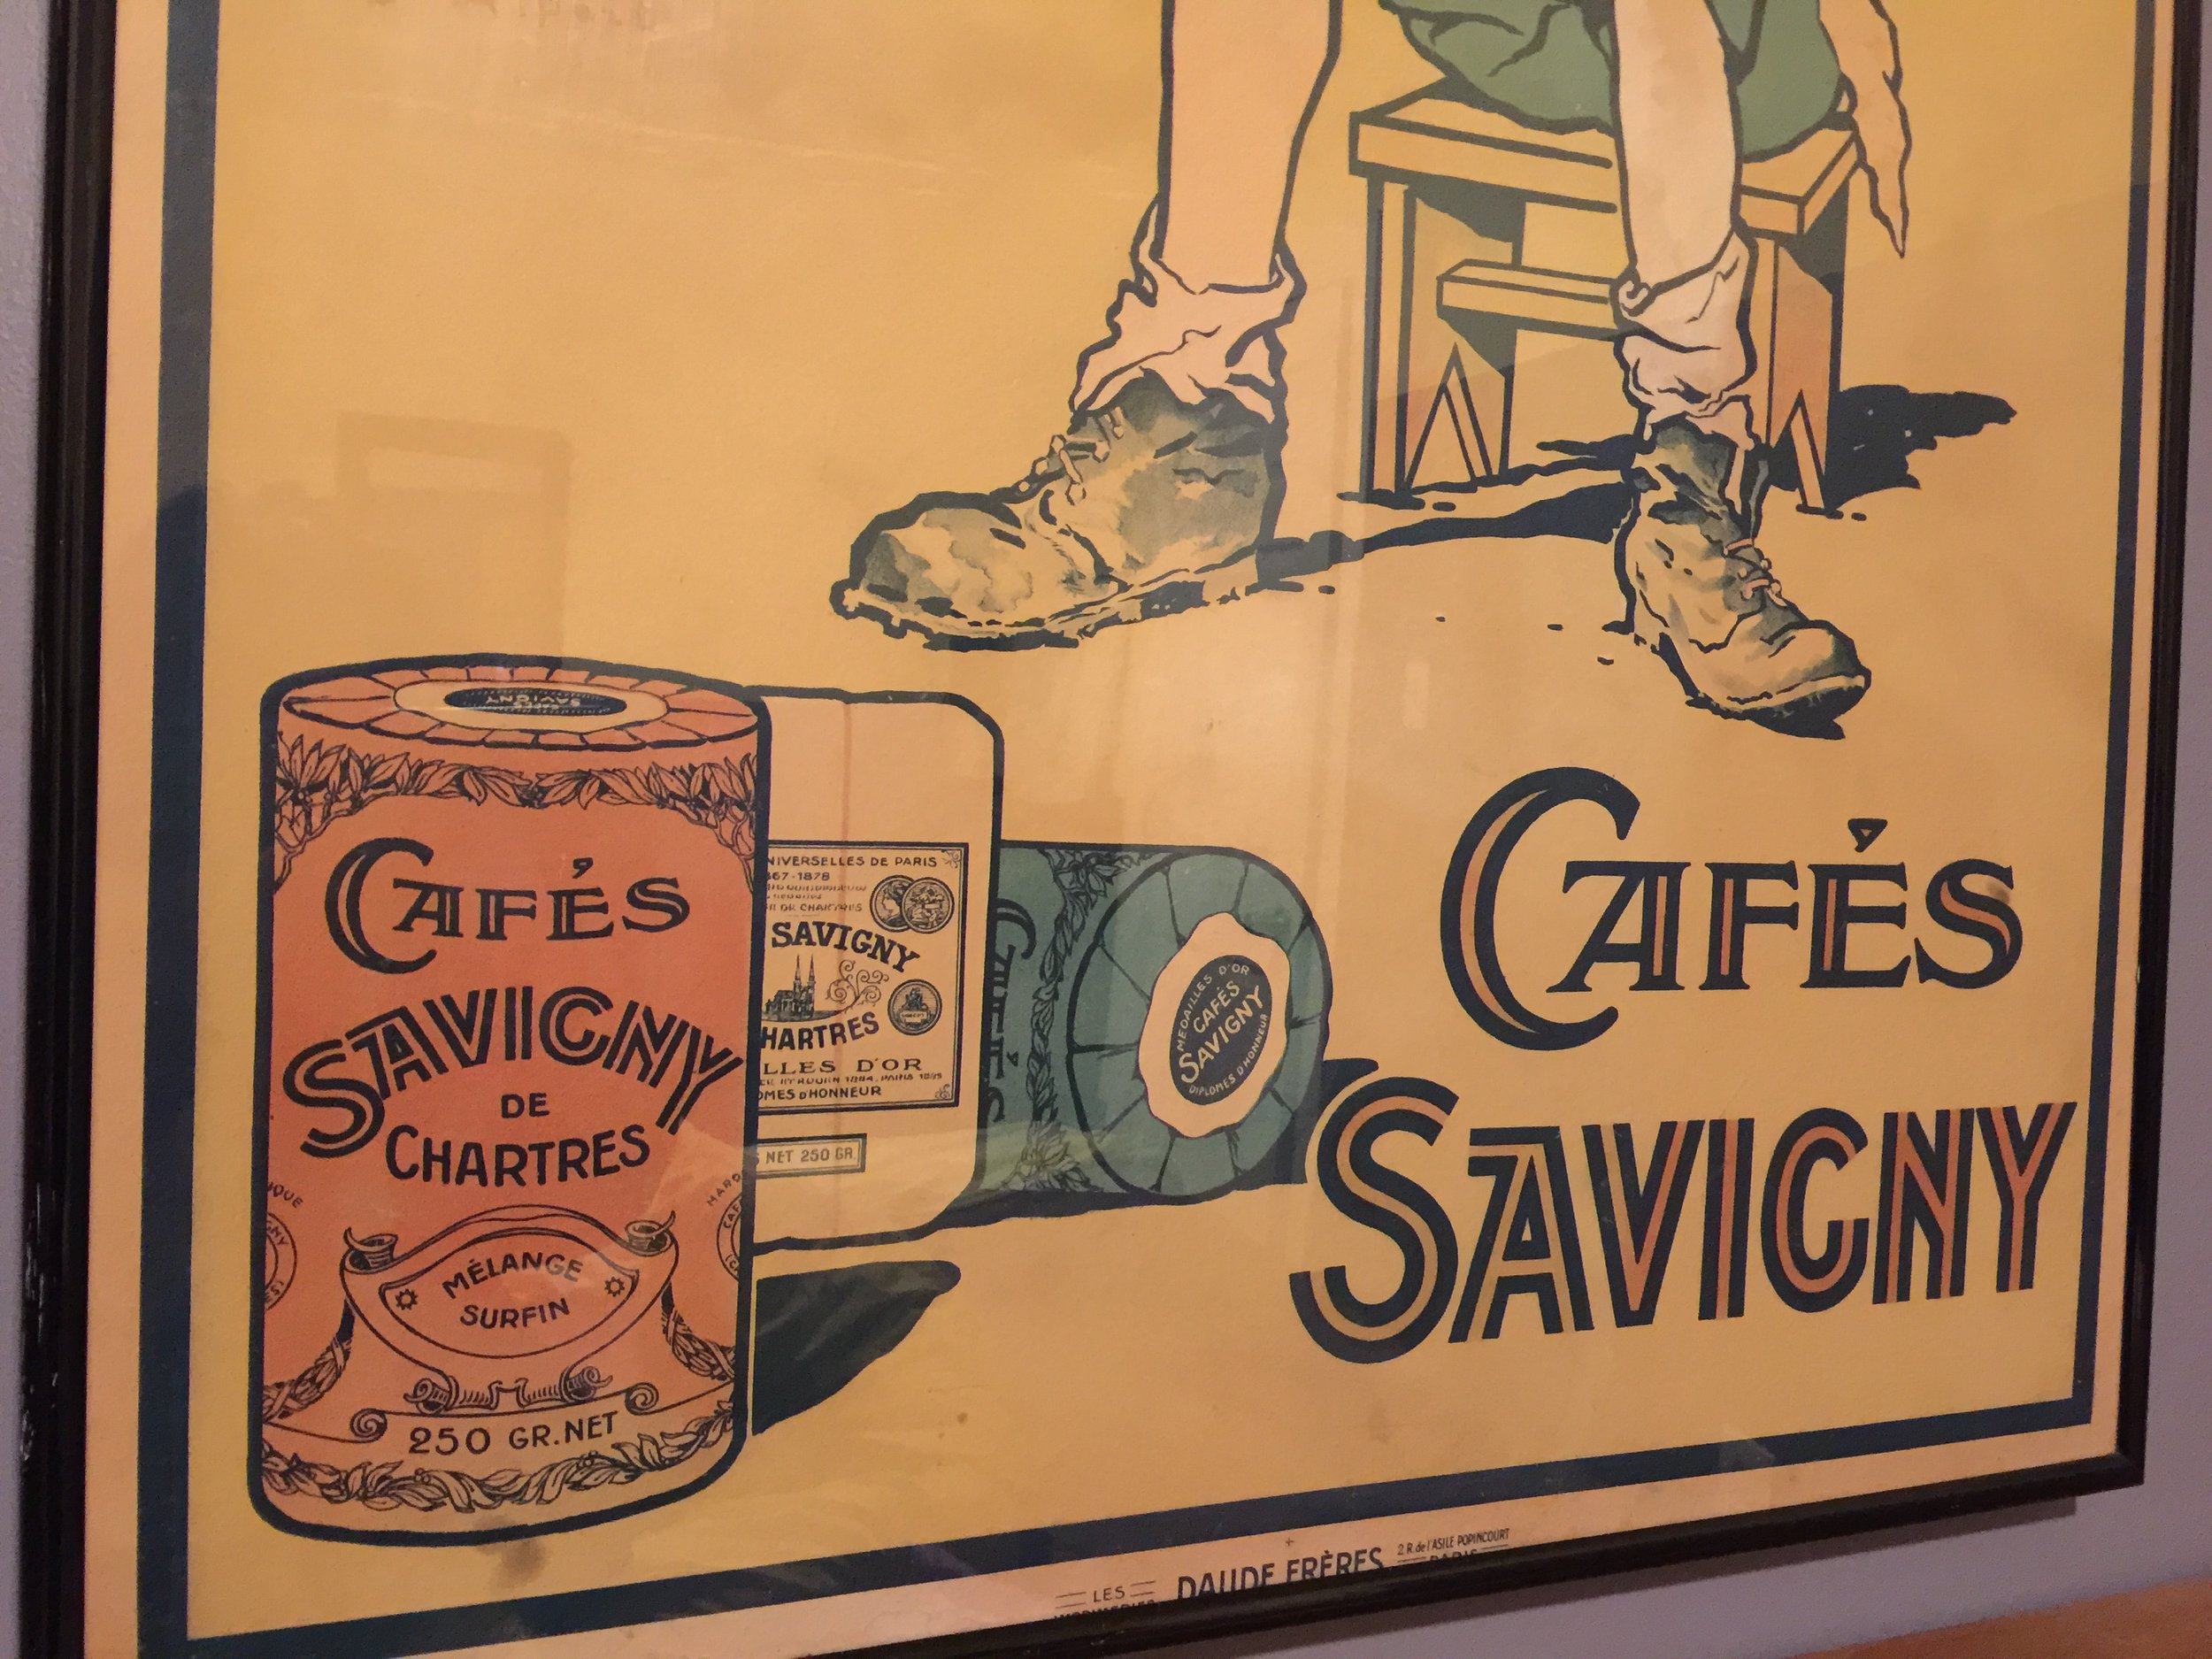 Georges Ripart - cafés Savigny ad by Daude Frères 4.JPG